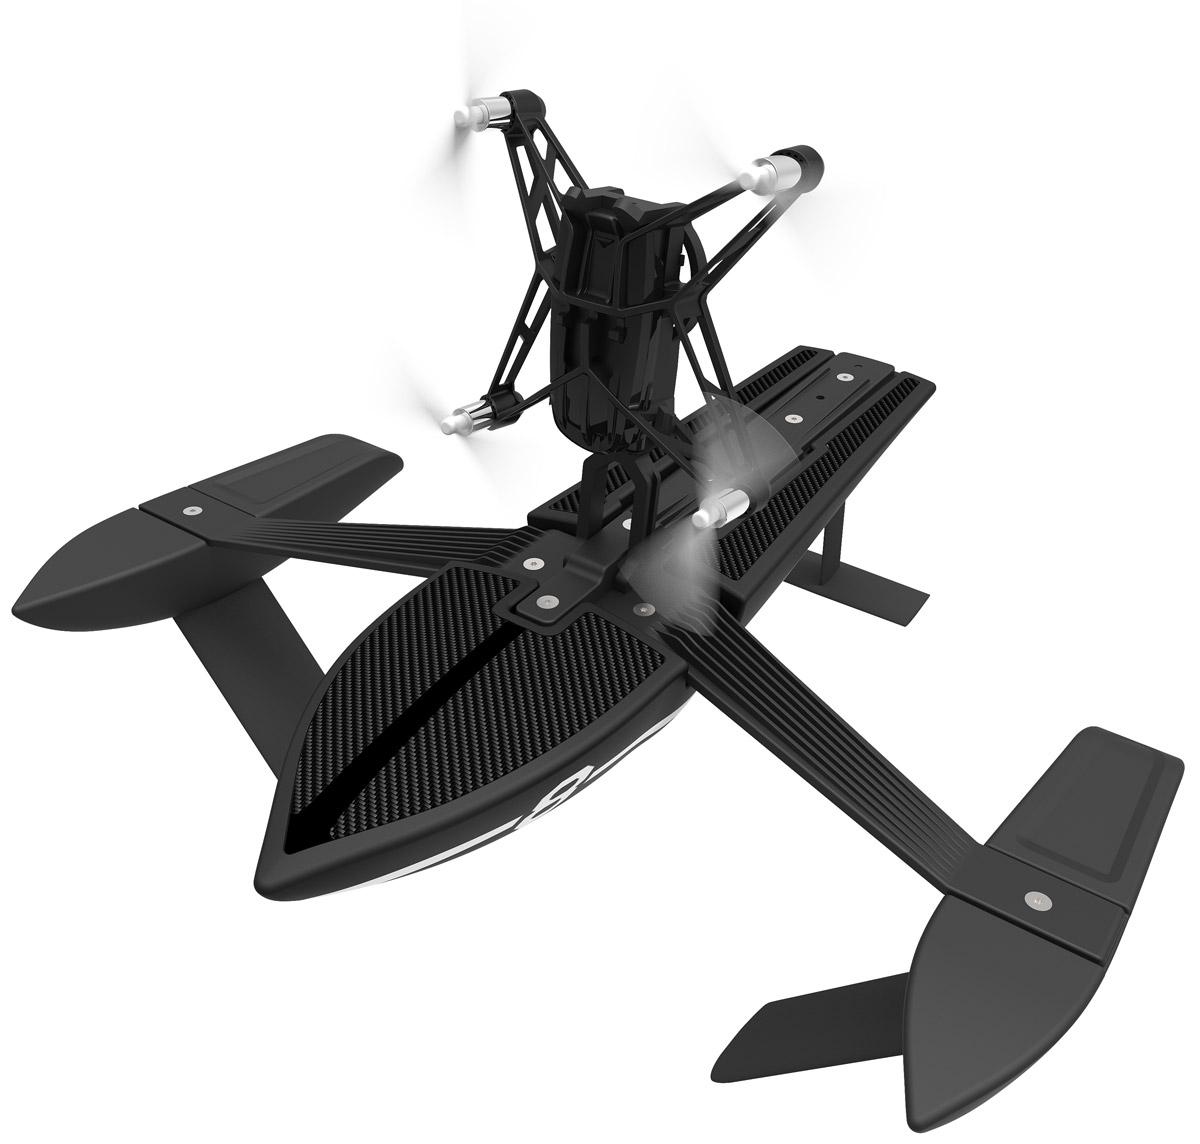 Parrot Квадрокоптер на радиоуправлении Minidrone Hydrofoil Orak и корабль